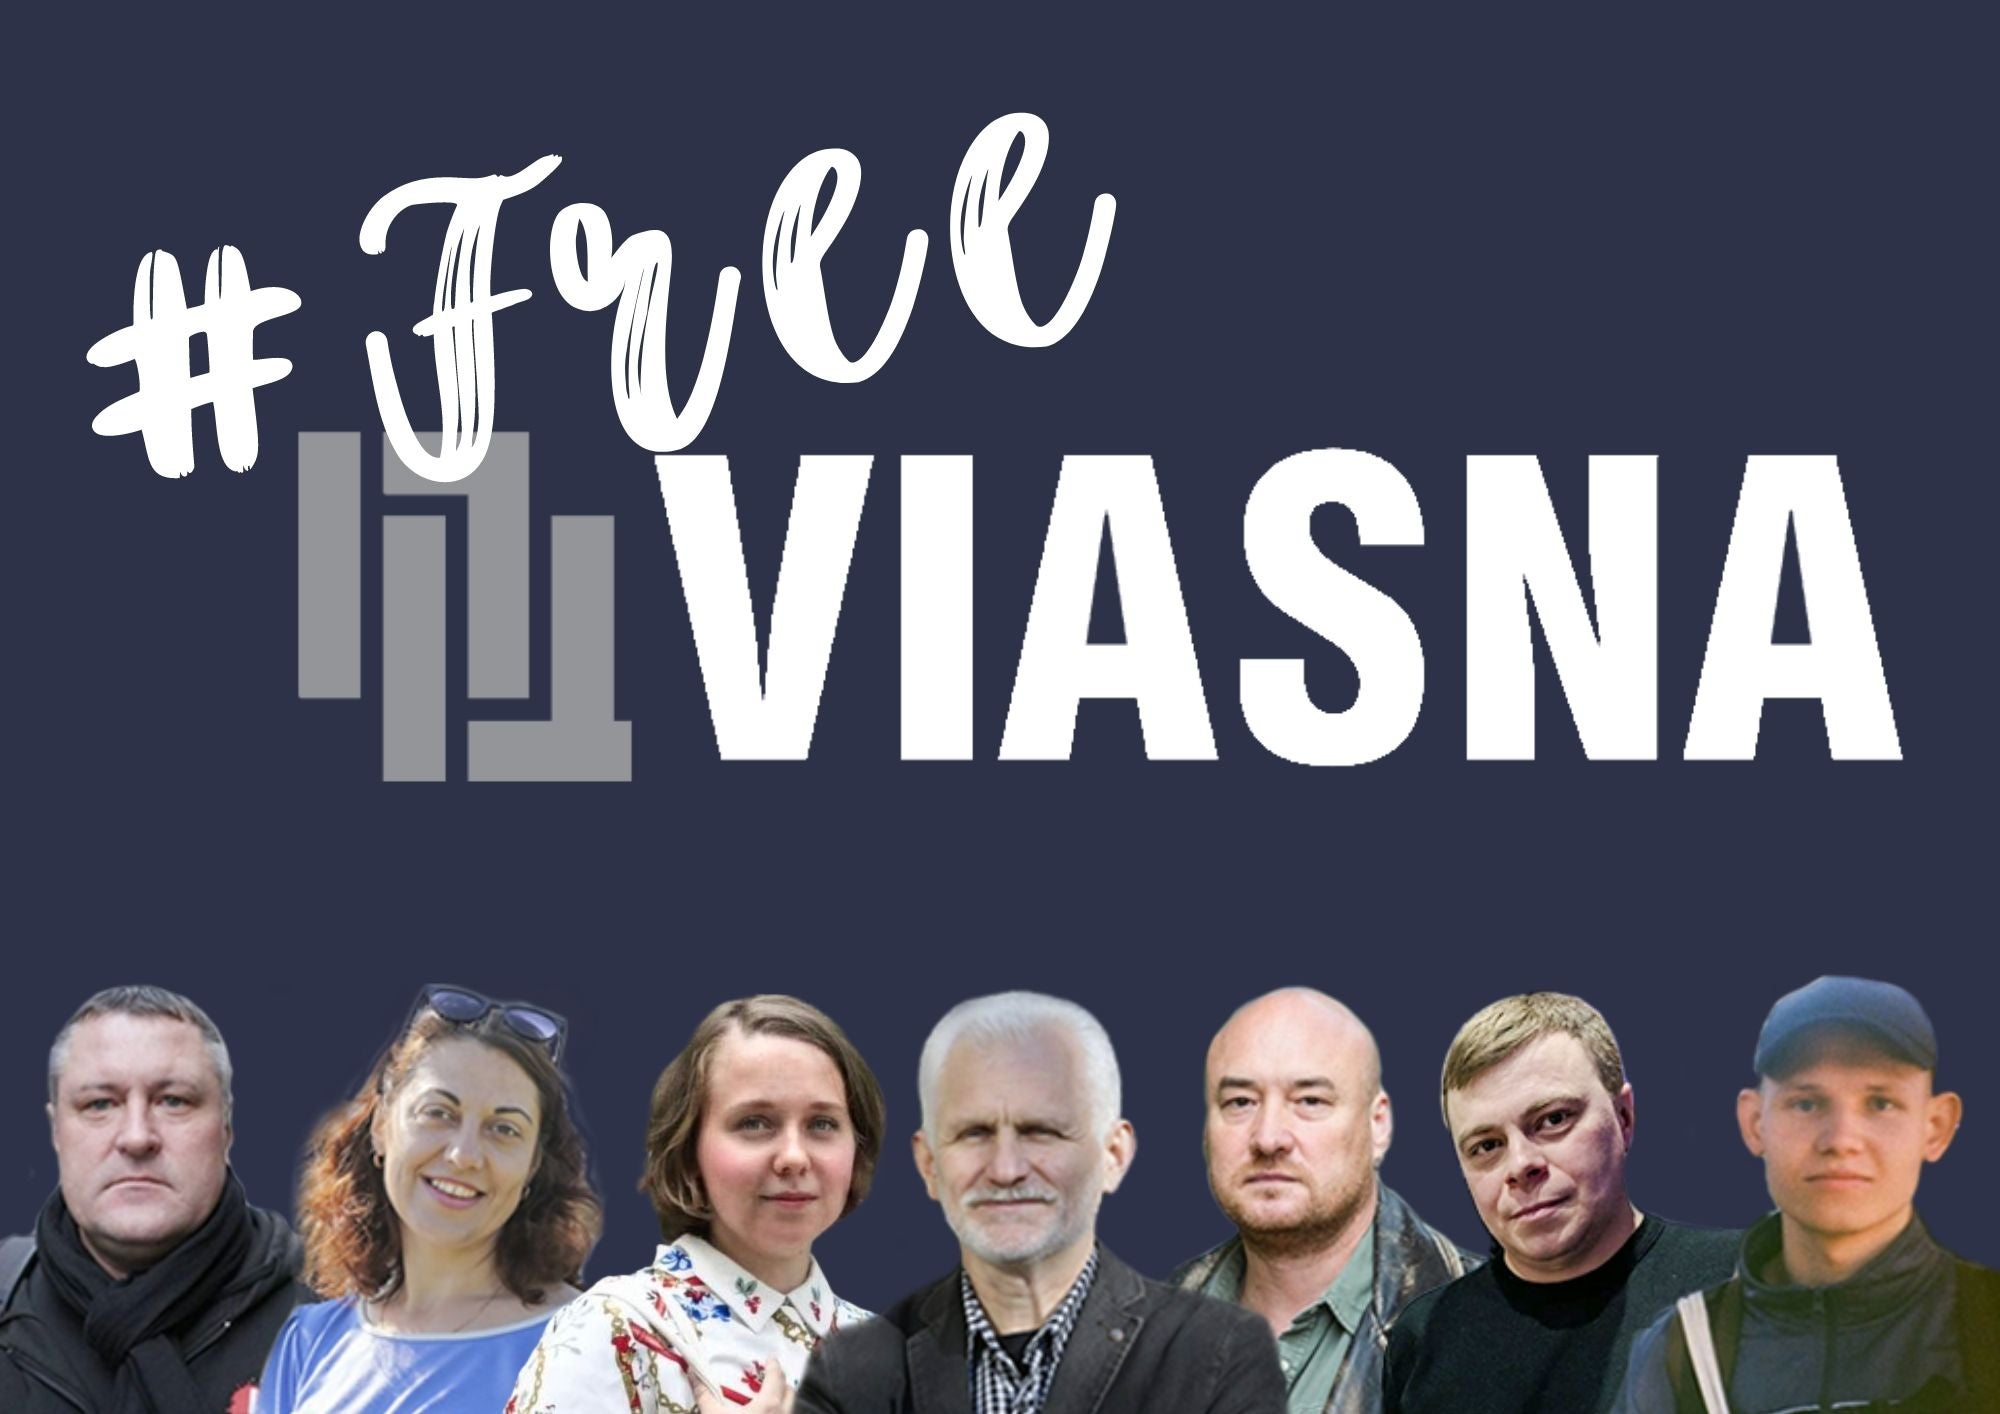 Free Viasna